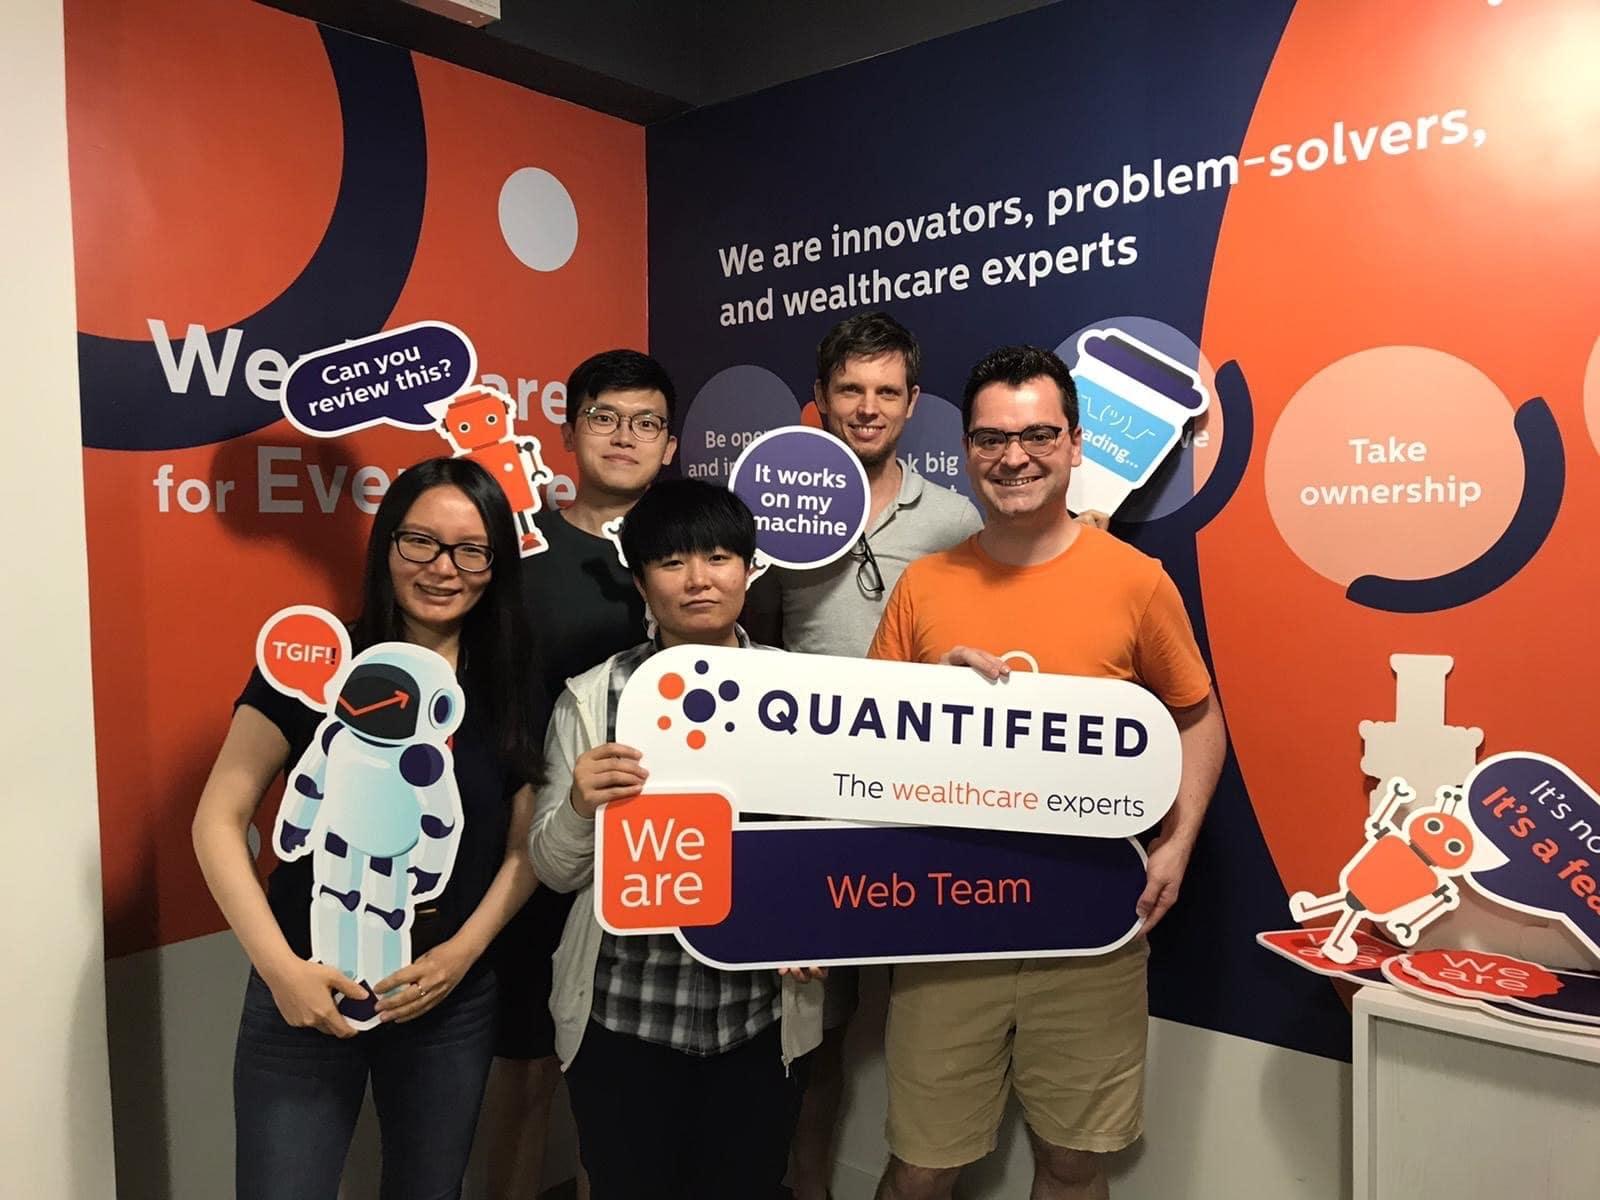 Quantifeed (HK)